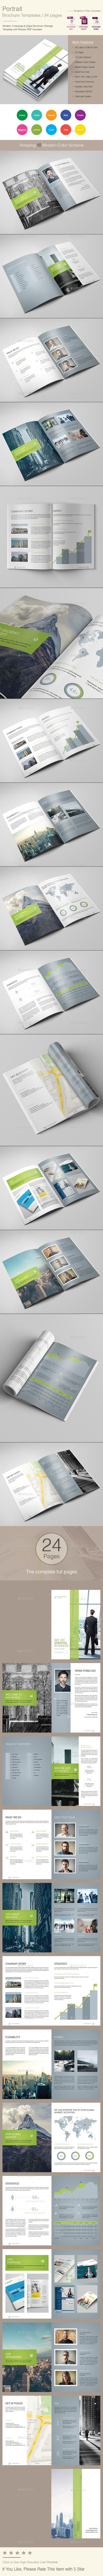 Portrait Brochure Templates - Corporate Brochures